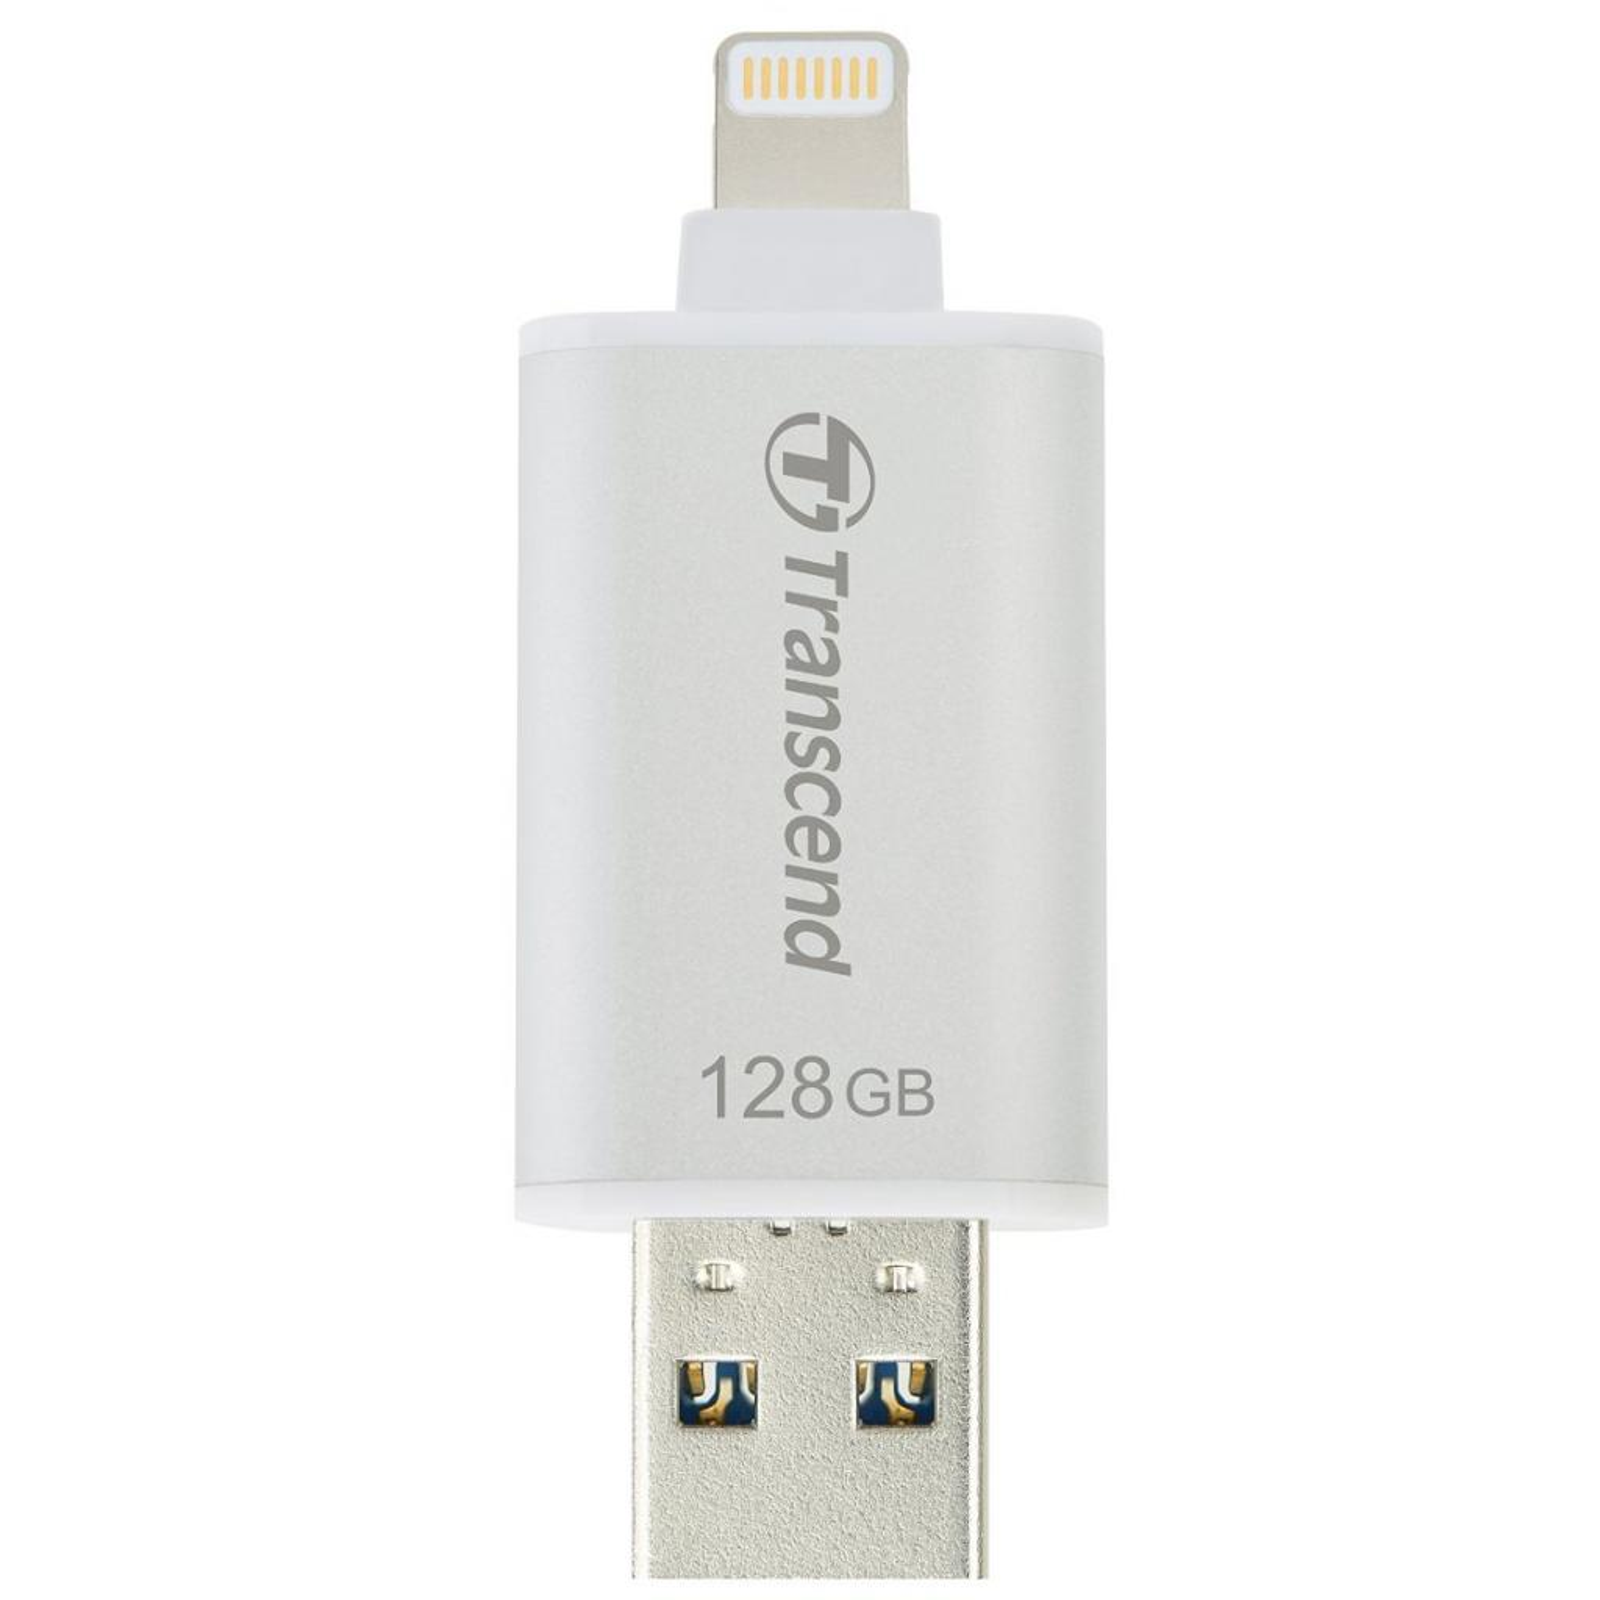 USB флеш накопитель Transcend 128GB JetDrive Go 300 Silver USB 3.1 (TS128GJDG300S) изображение 4